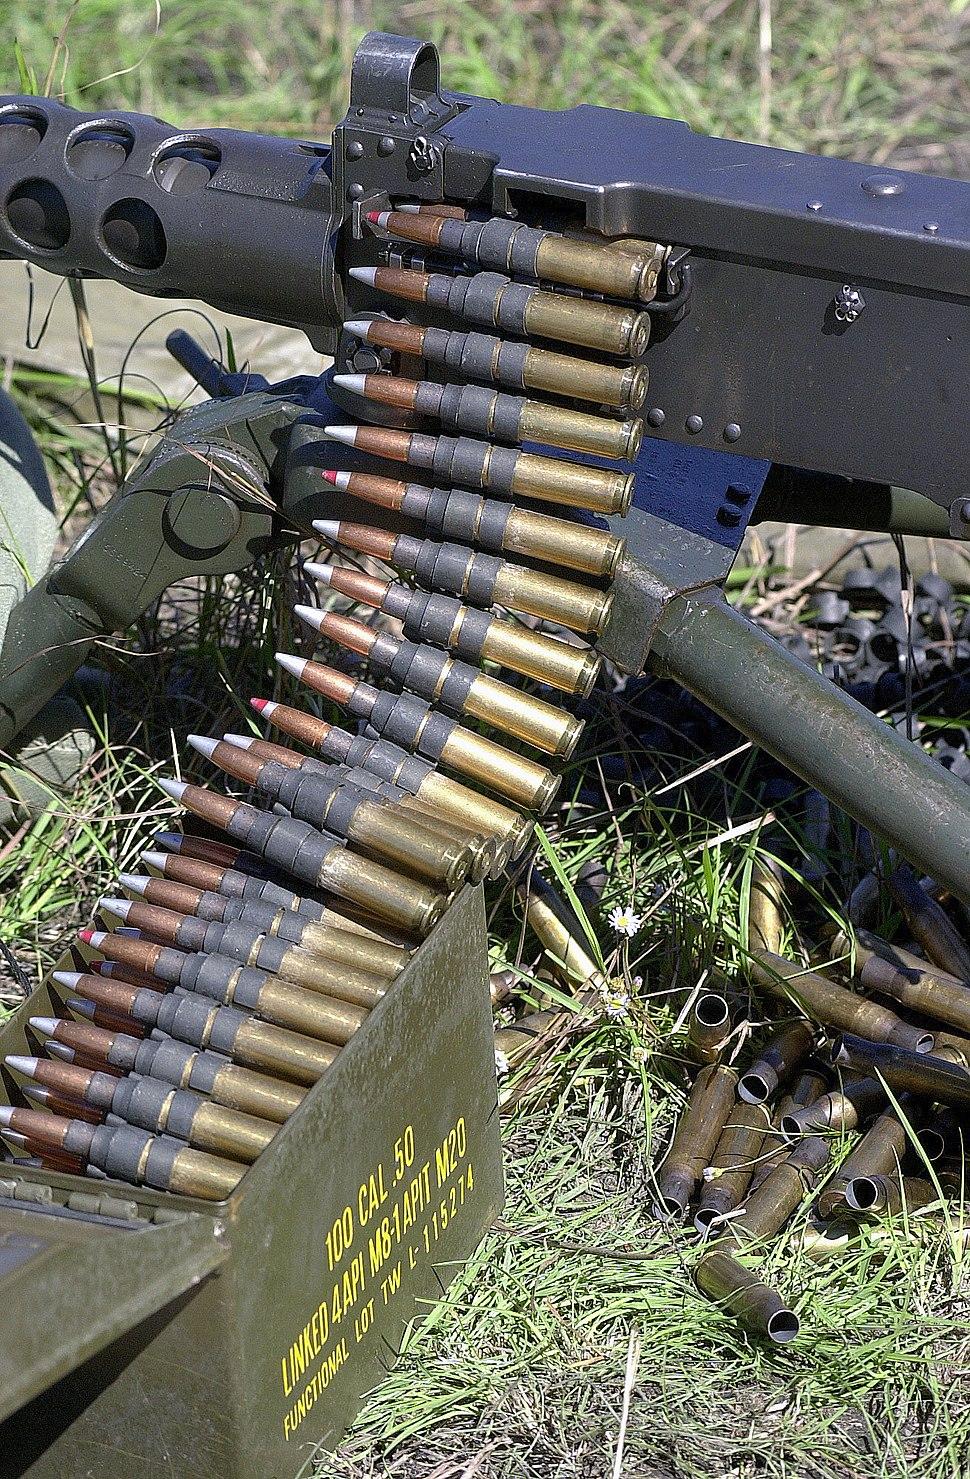 A close up of 0.50 Caliber (12.7 mm) Browning Ball M33 Ammunition loaded onto a Browning M2 HB 0.50 caliber heavy machine.JPEG